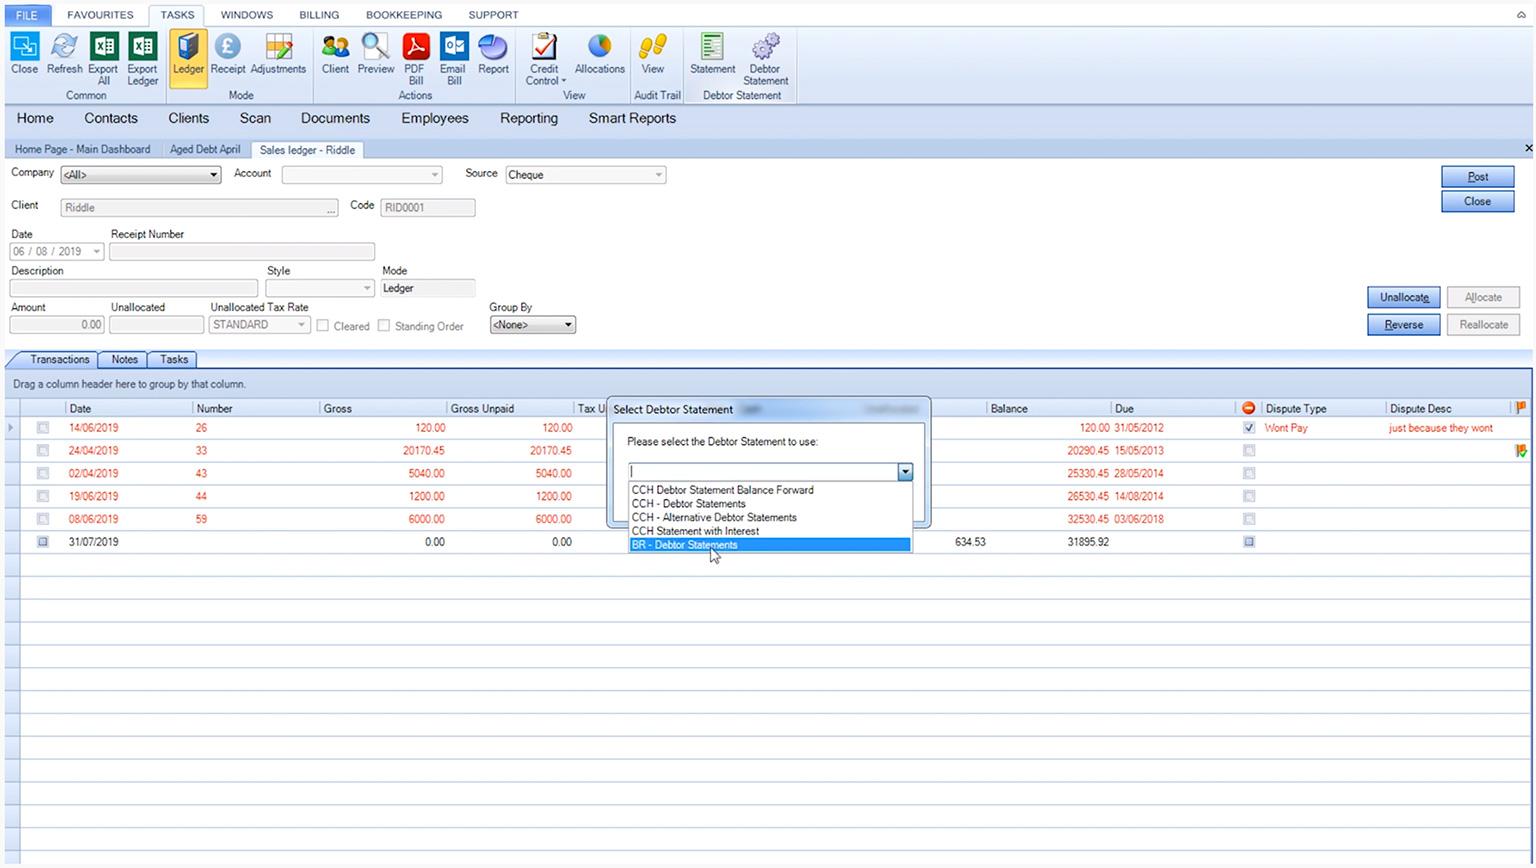 CCH Practice Management - Pre-empt credit control issues Video